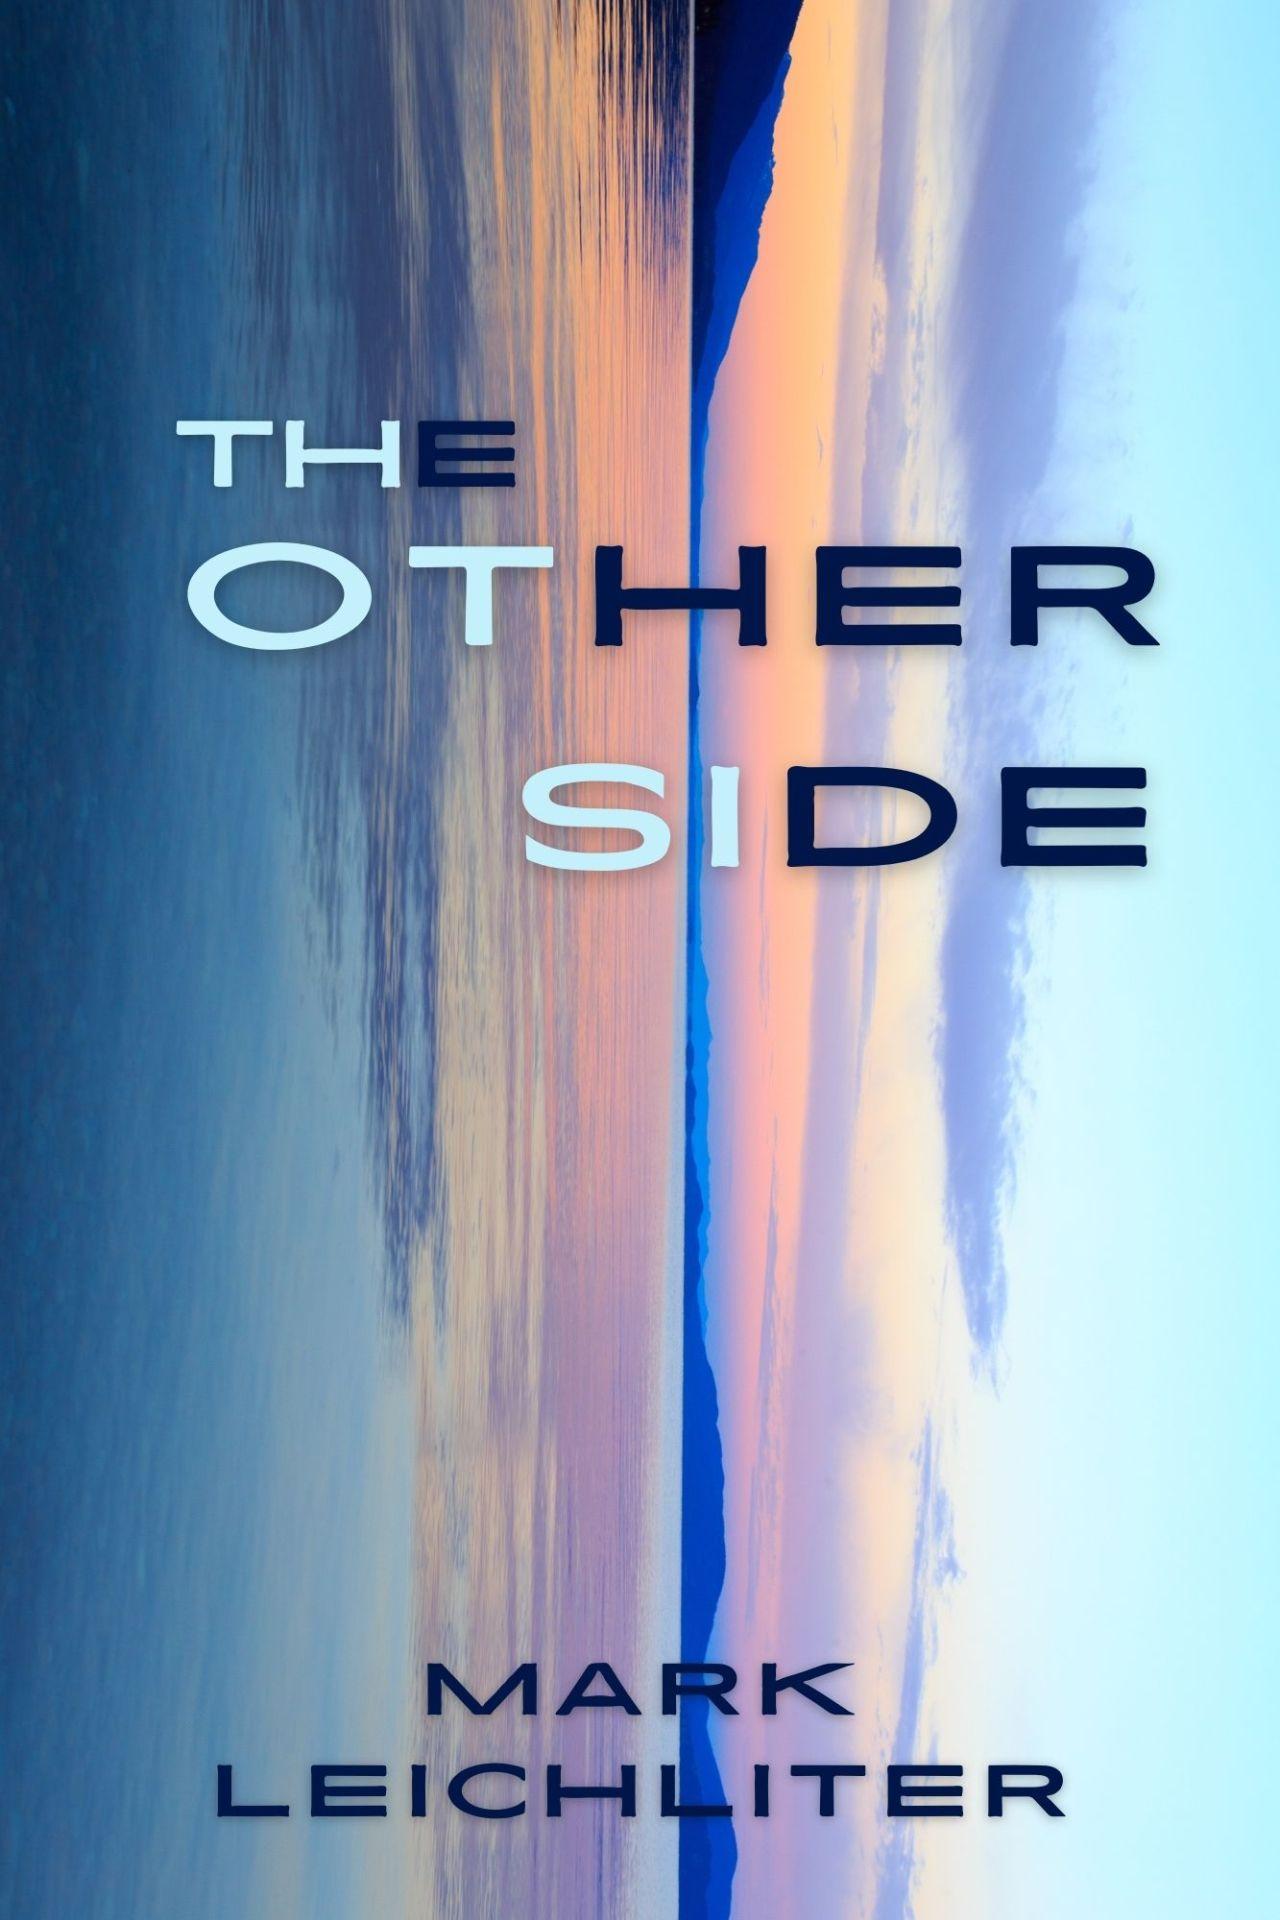 Mark Leichliter: The OtherSide